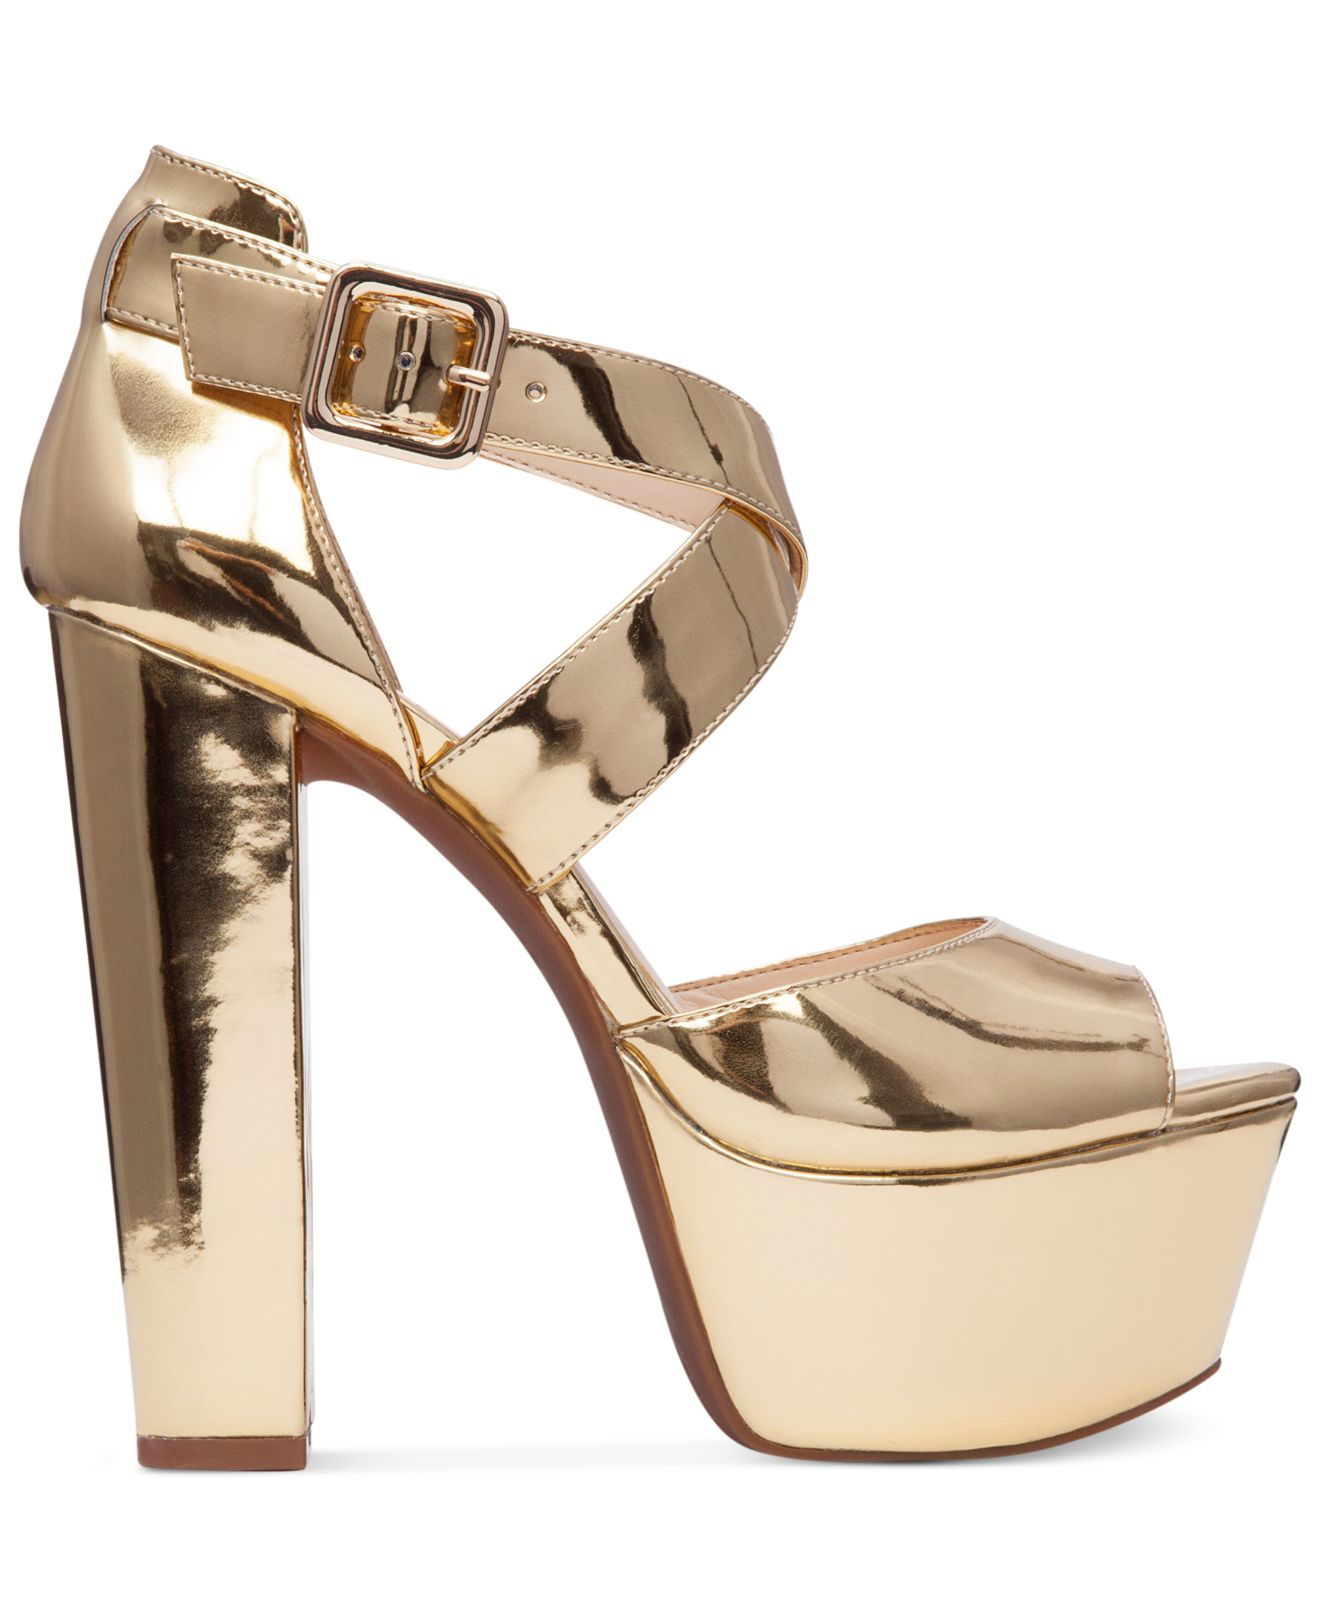 c004ab2d5a2 Lyst - Jessica Simpson Derian Platform Sandals in Metallic